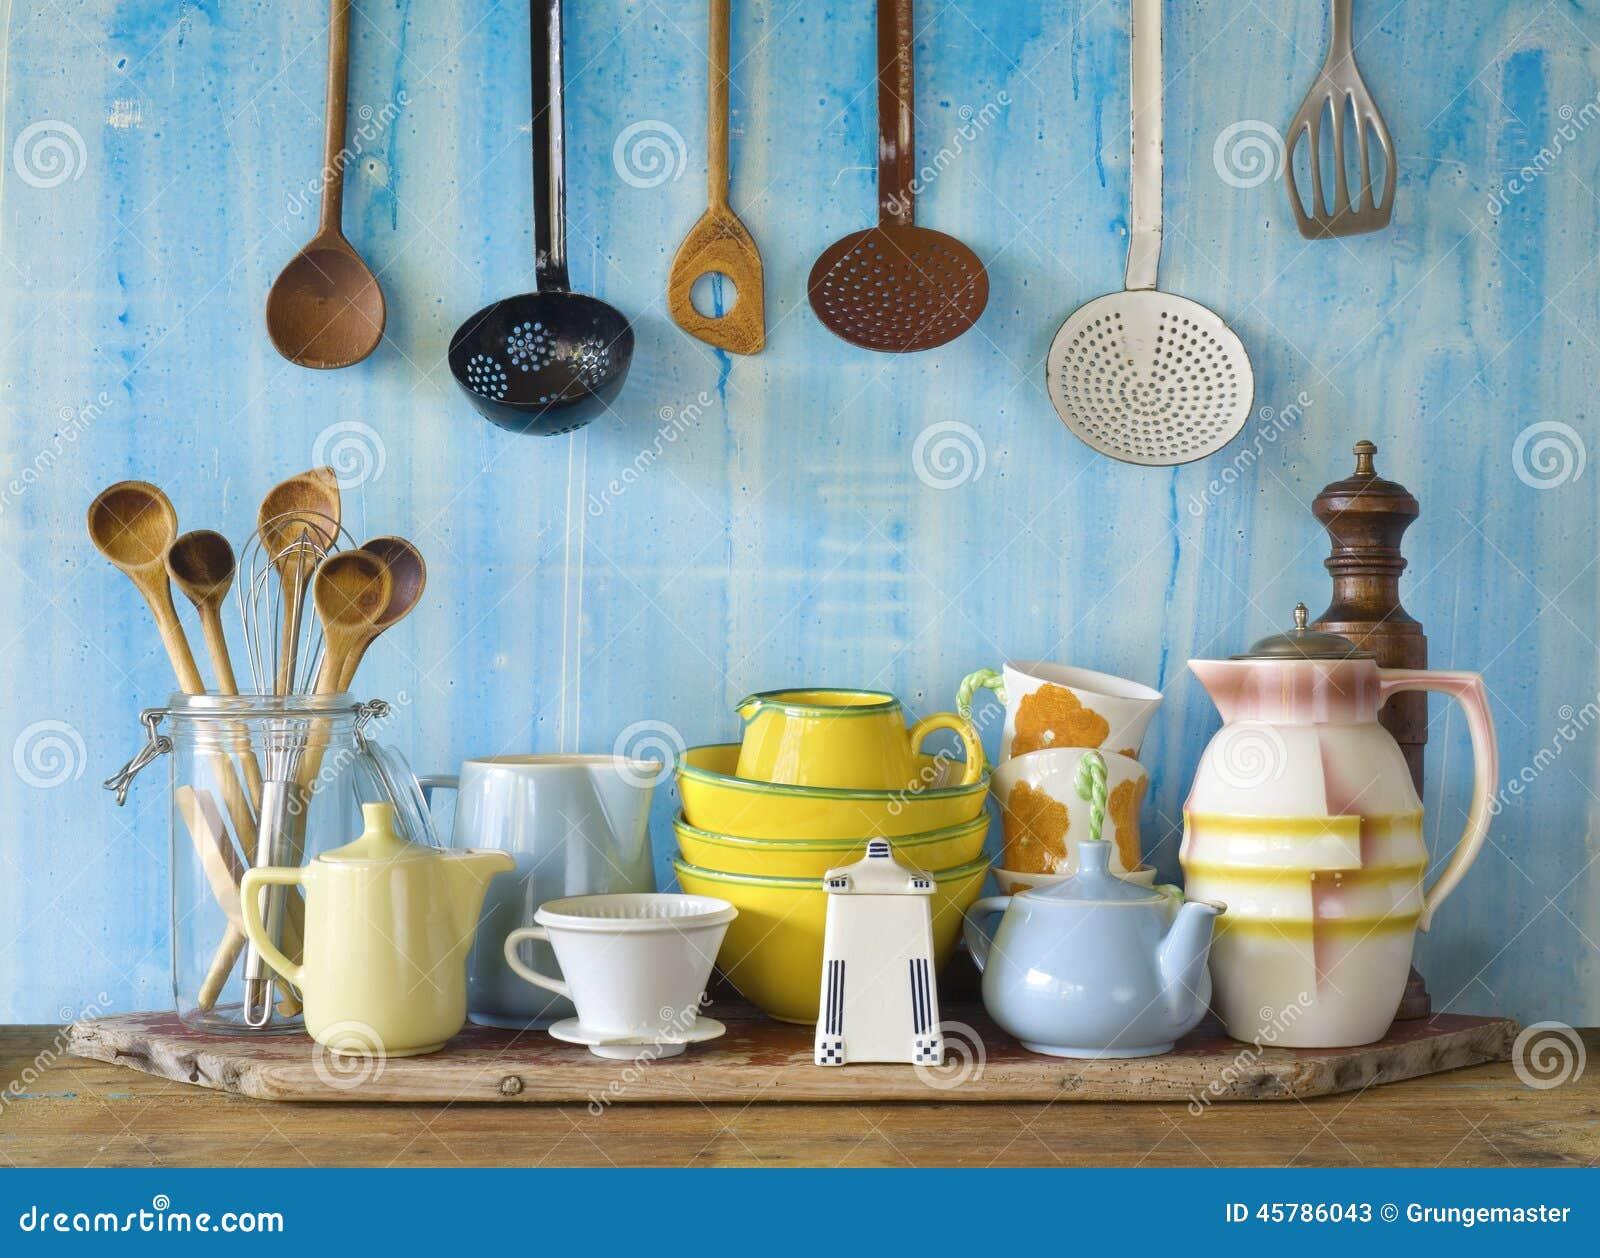 Vintage kitchenware - Collection Of Vintage Kitchenware